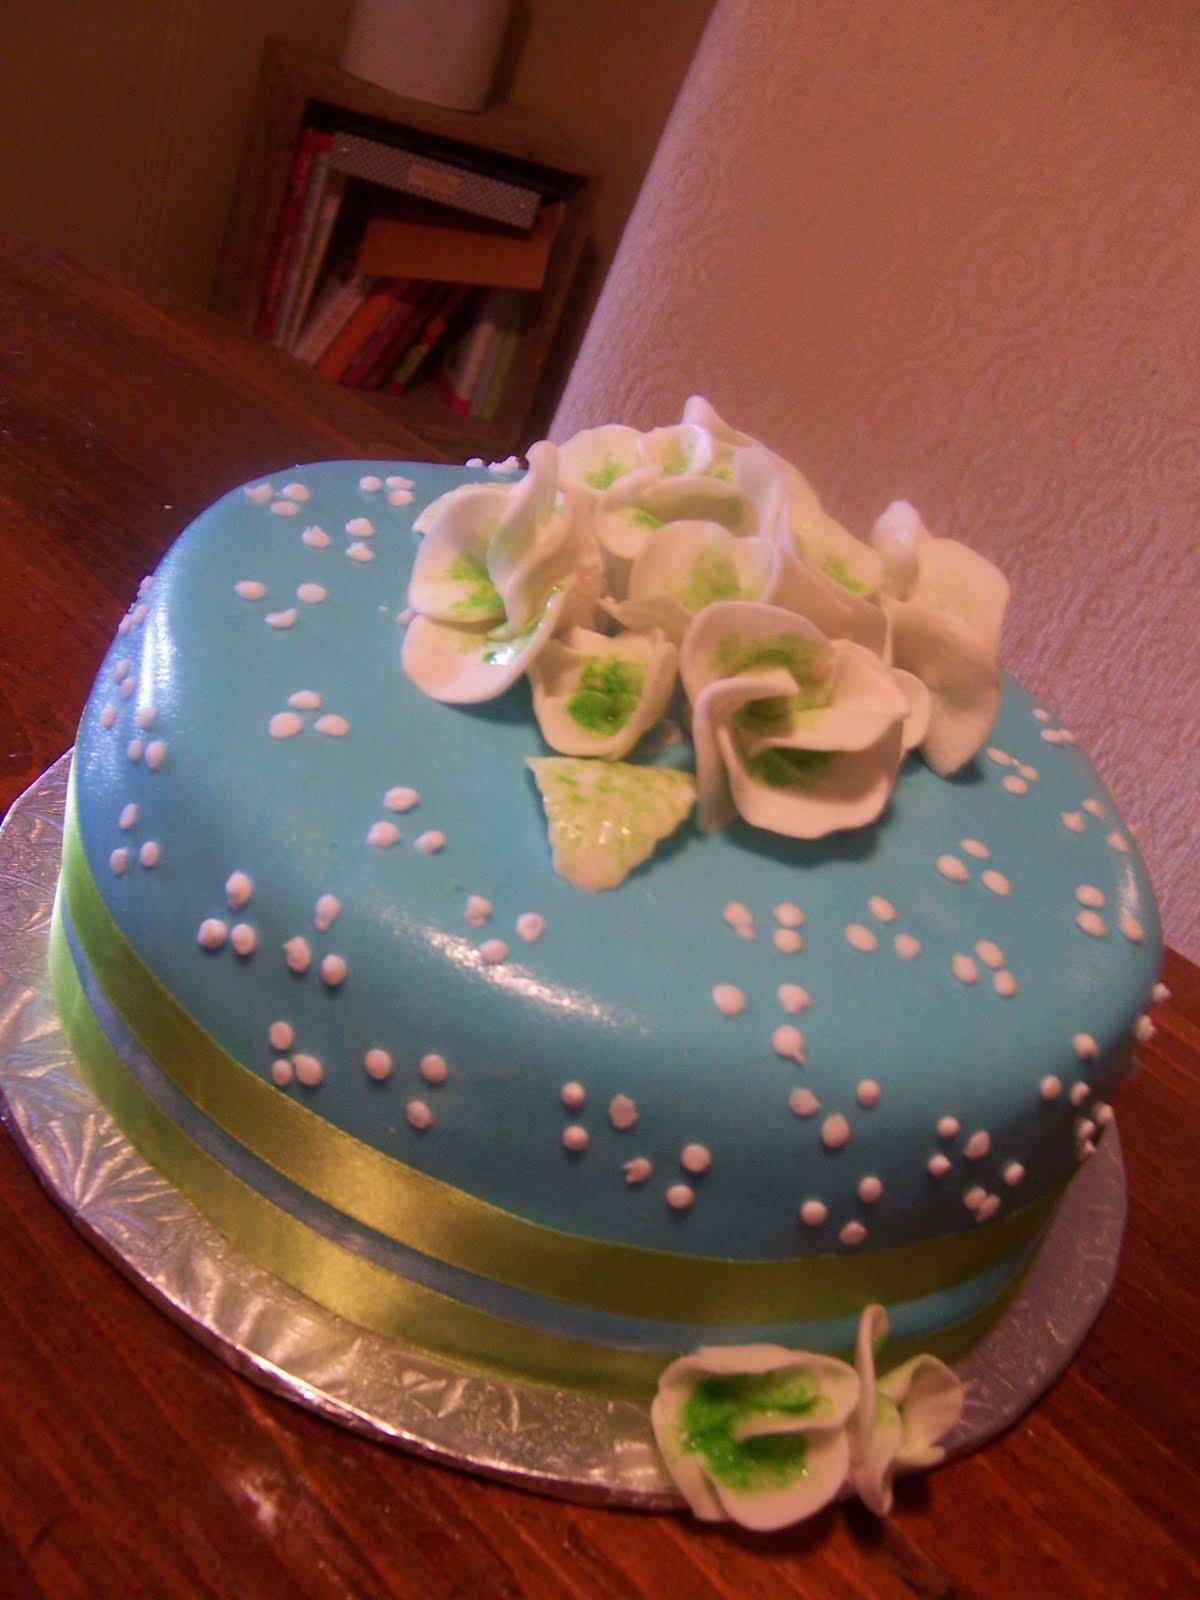 Second Generation Cake Design Angies 31st Birthday